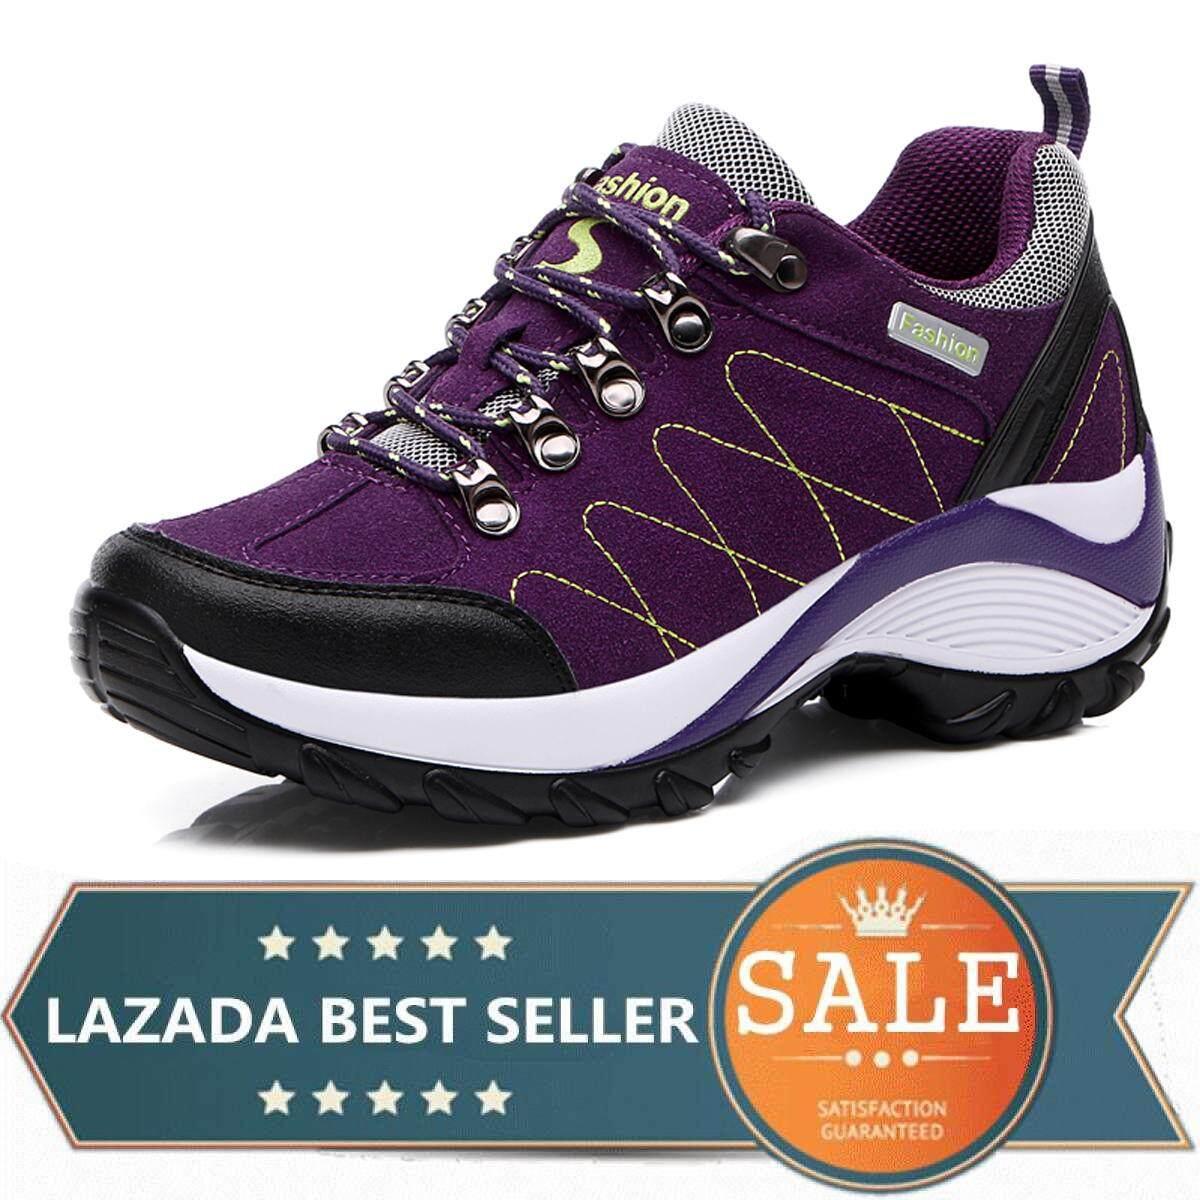 Waterproof Hiking Shoes Women Height Increasing Climbing Mountain Shoes  Women Leather Outdoor Hiking Boots 058 1c4a822f0a41